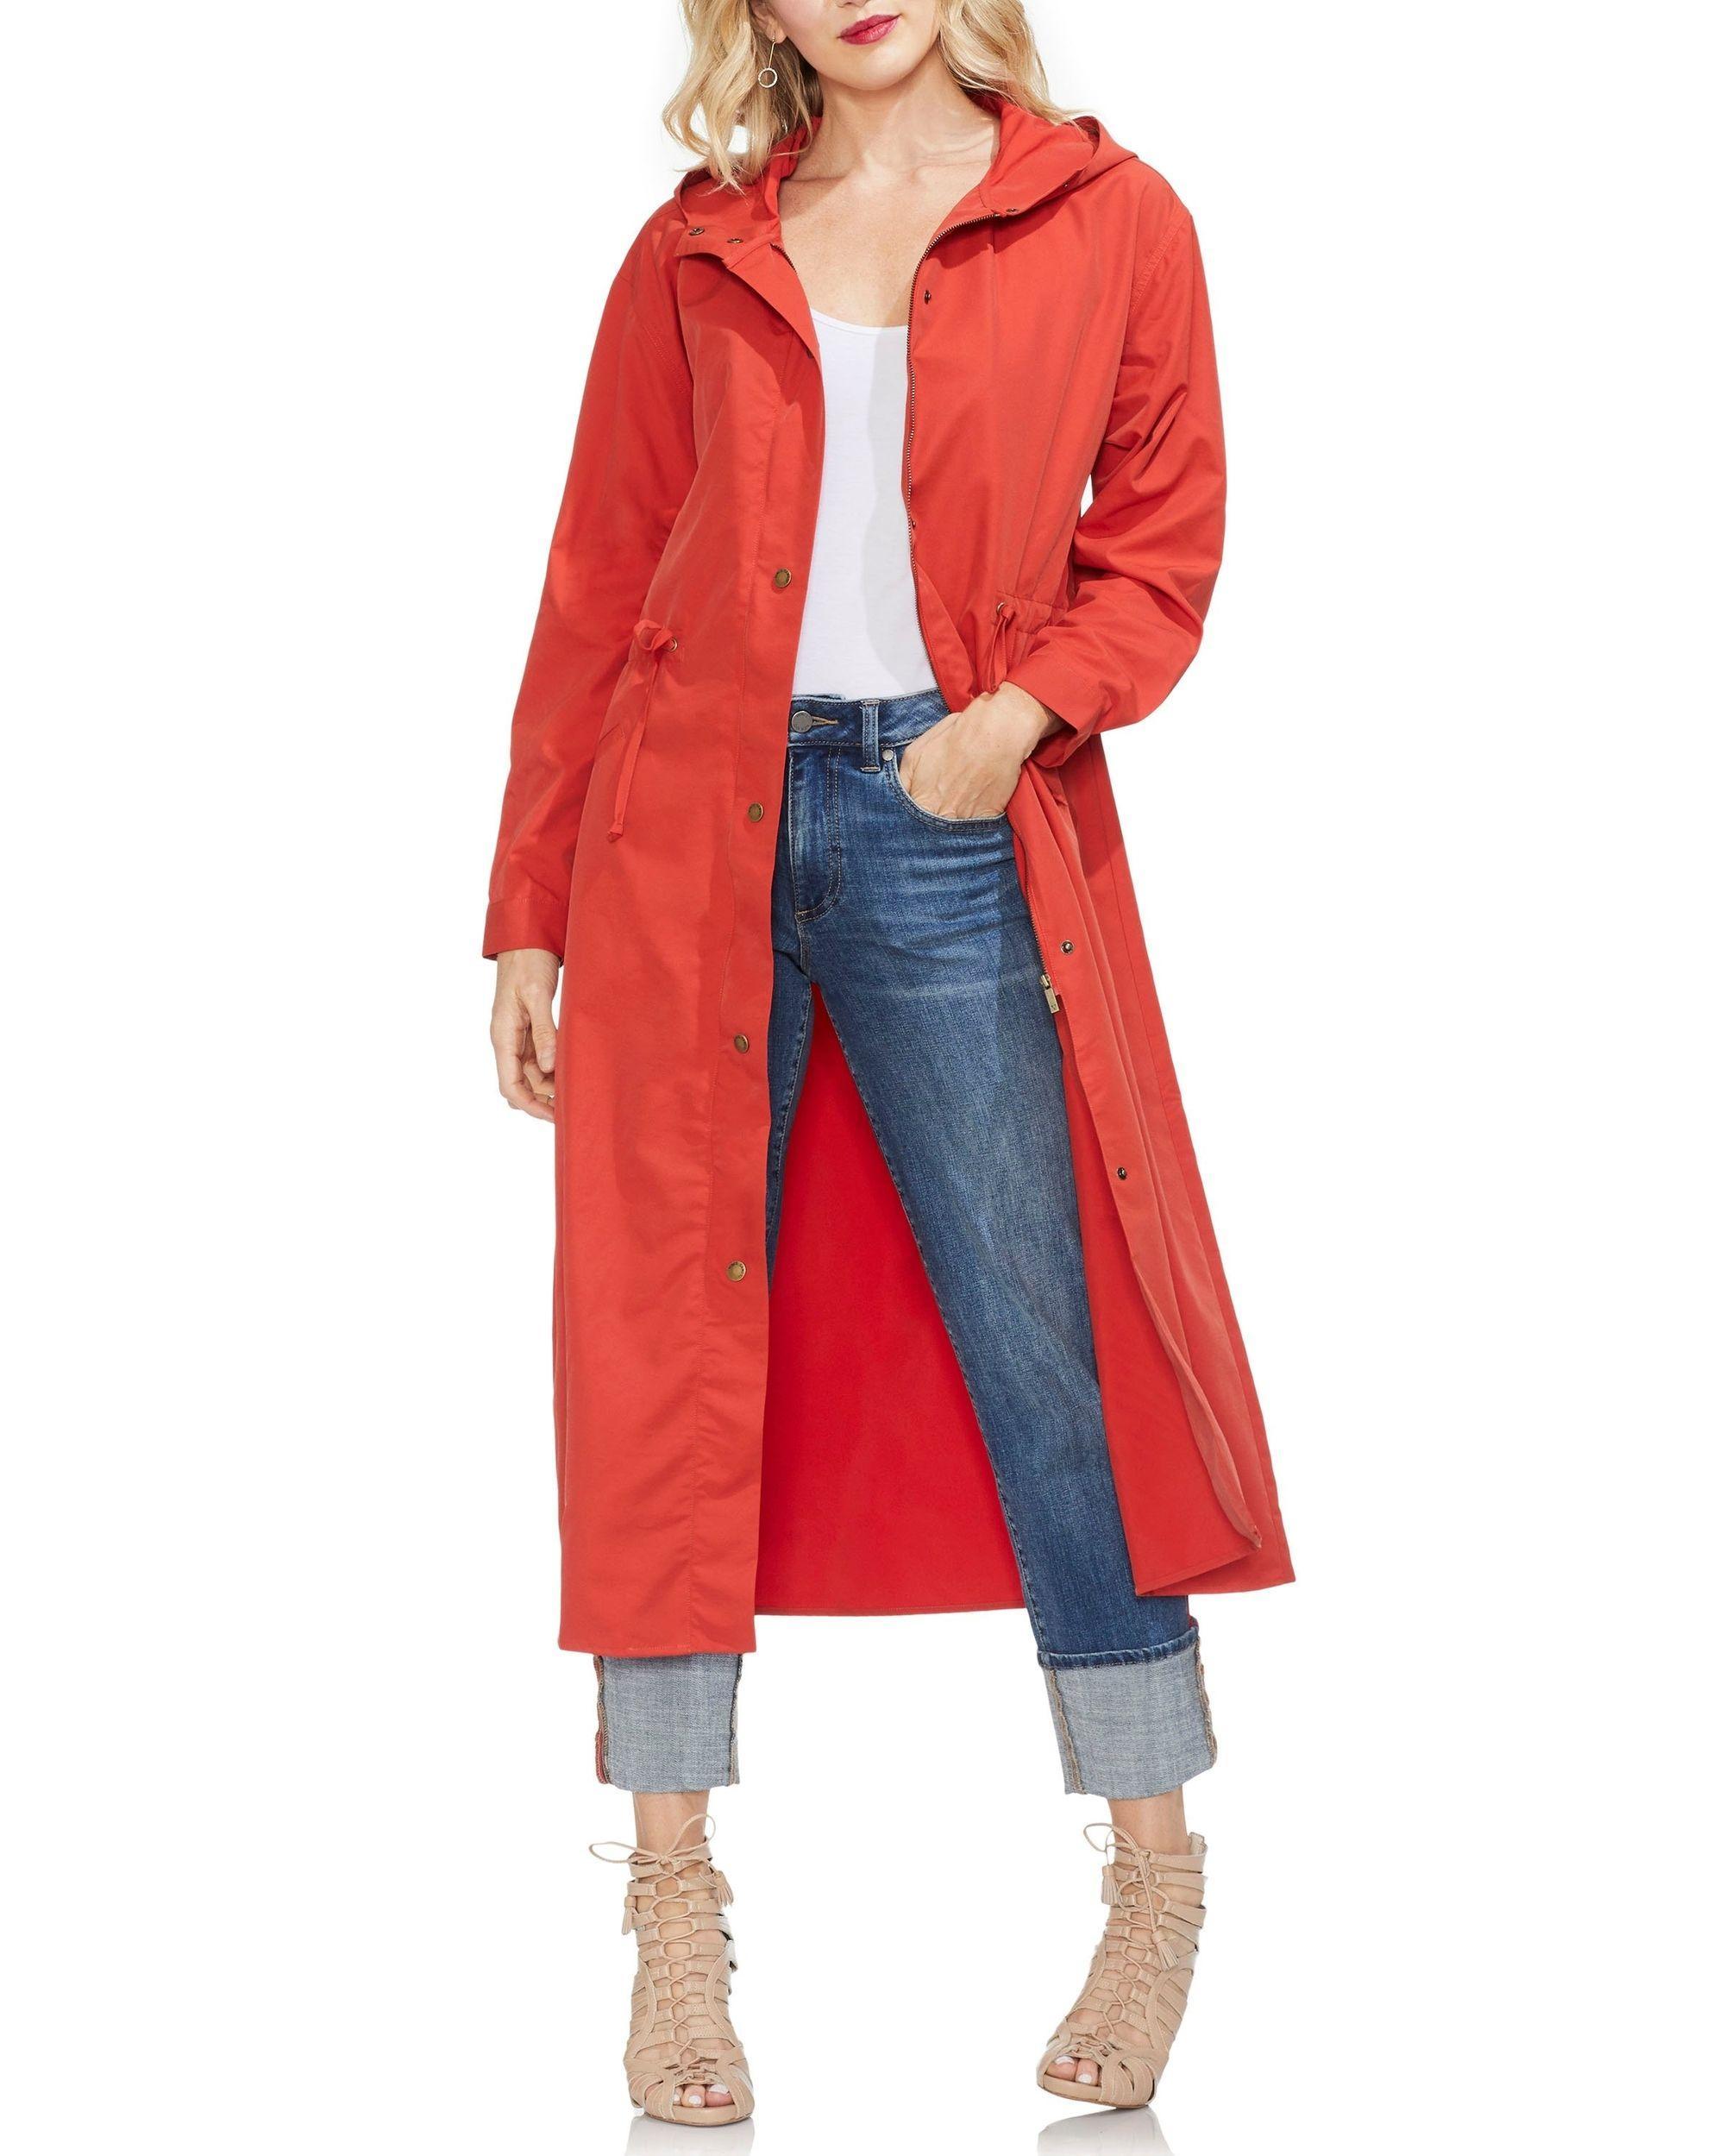 92dd35c2095b Vince Camuto - Red Cinch-waist Hooded Coat - Lyst. View fullscreen